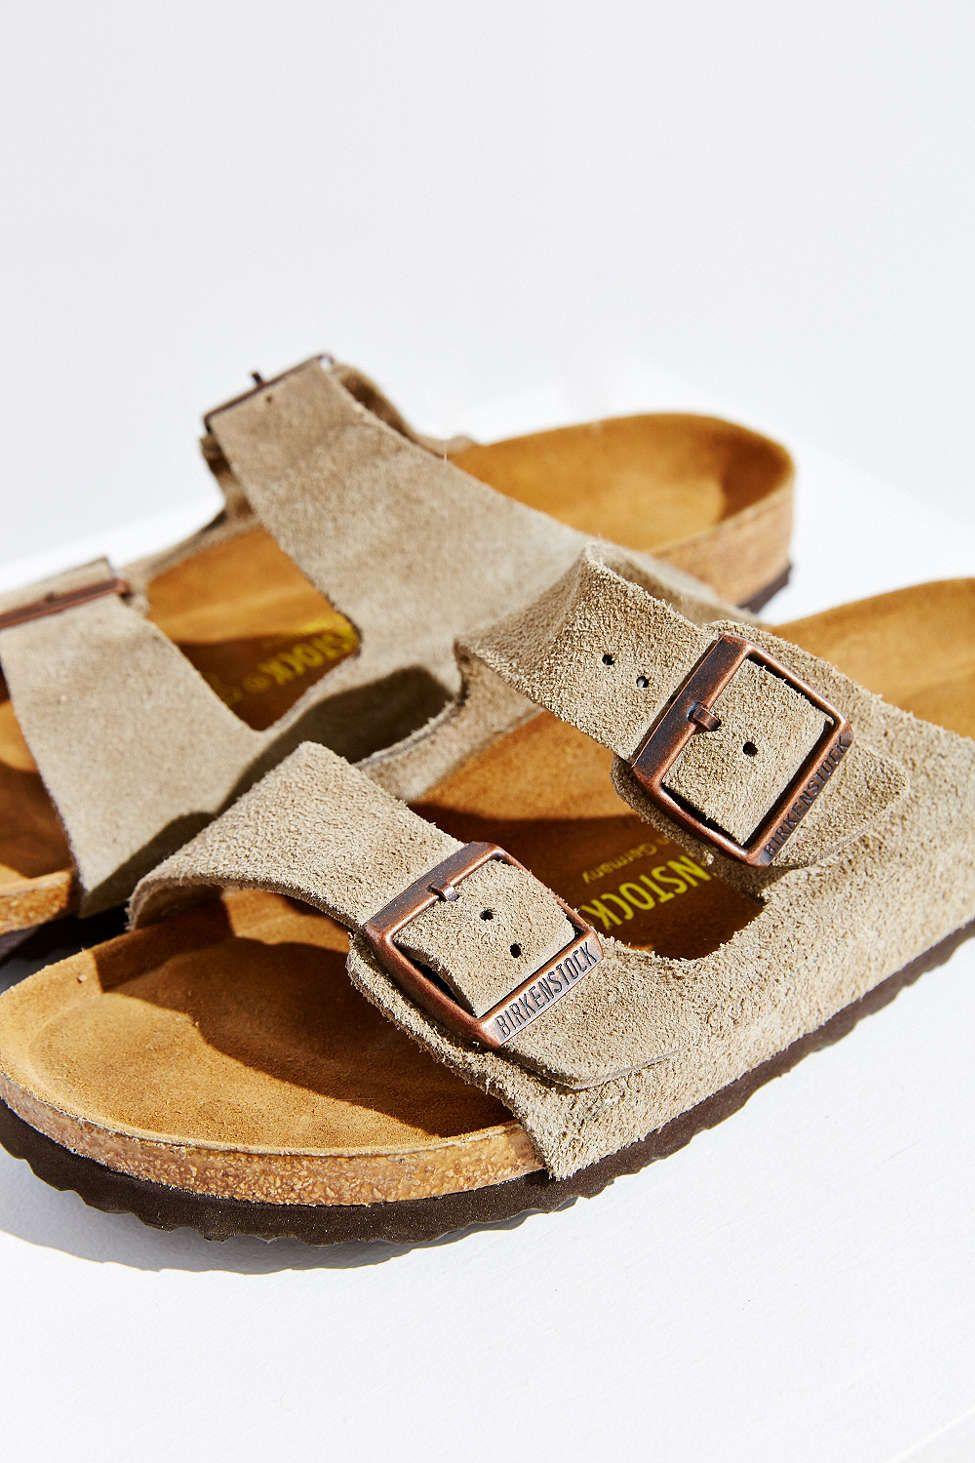 0e4c54cc7d79 Birkenstock Arizona Suede Soft Footbed Sandal